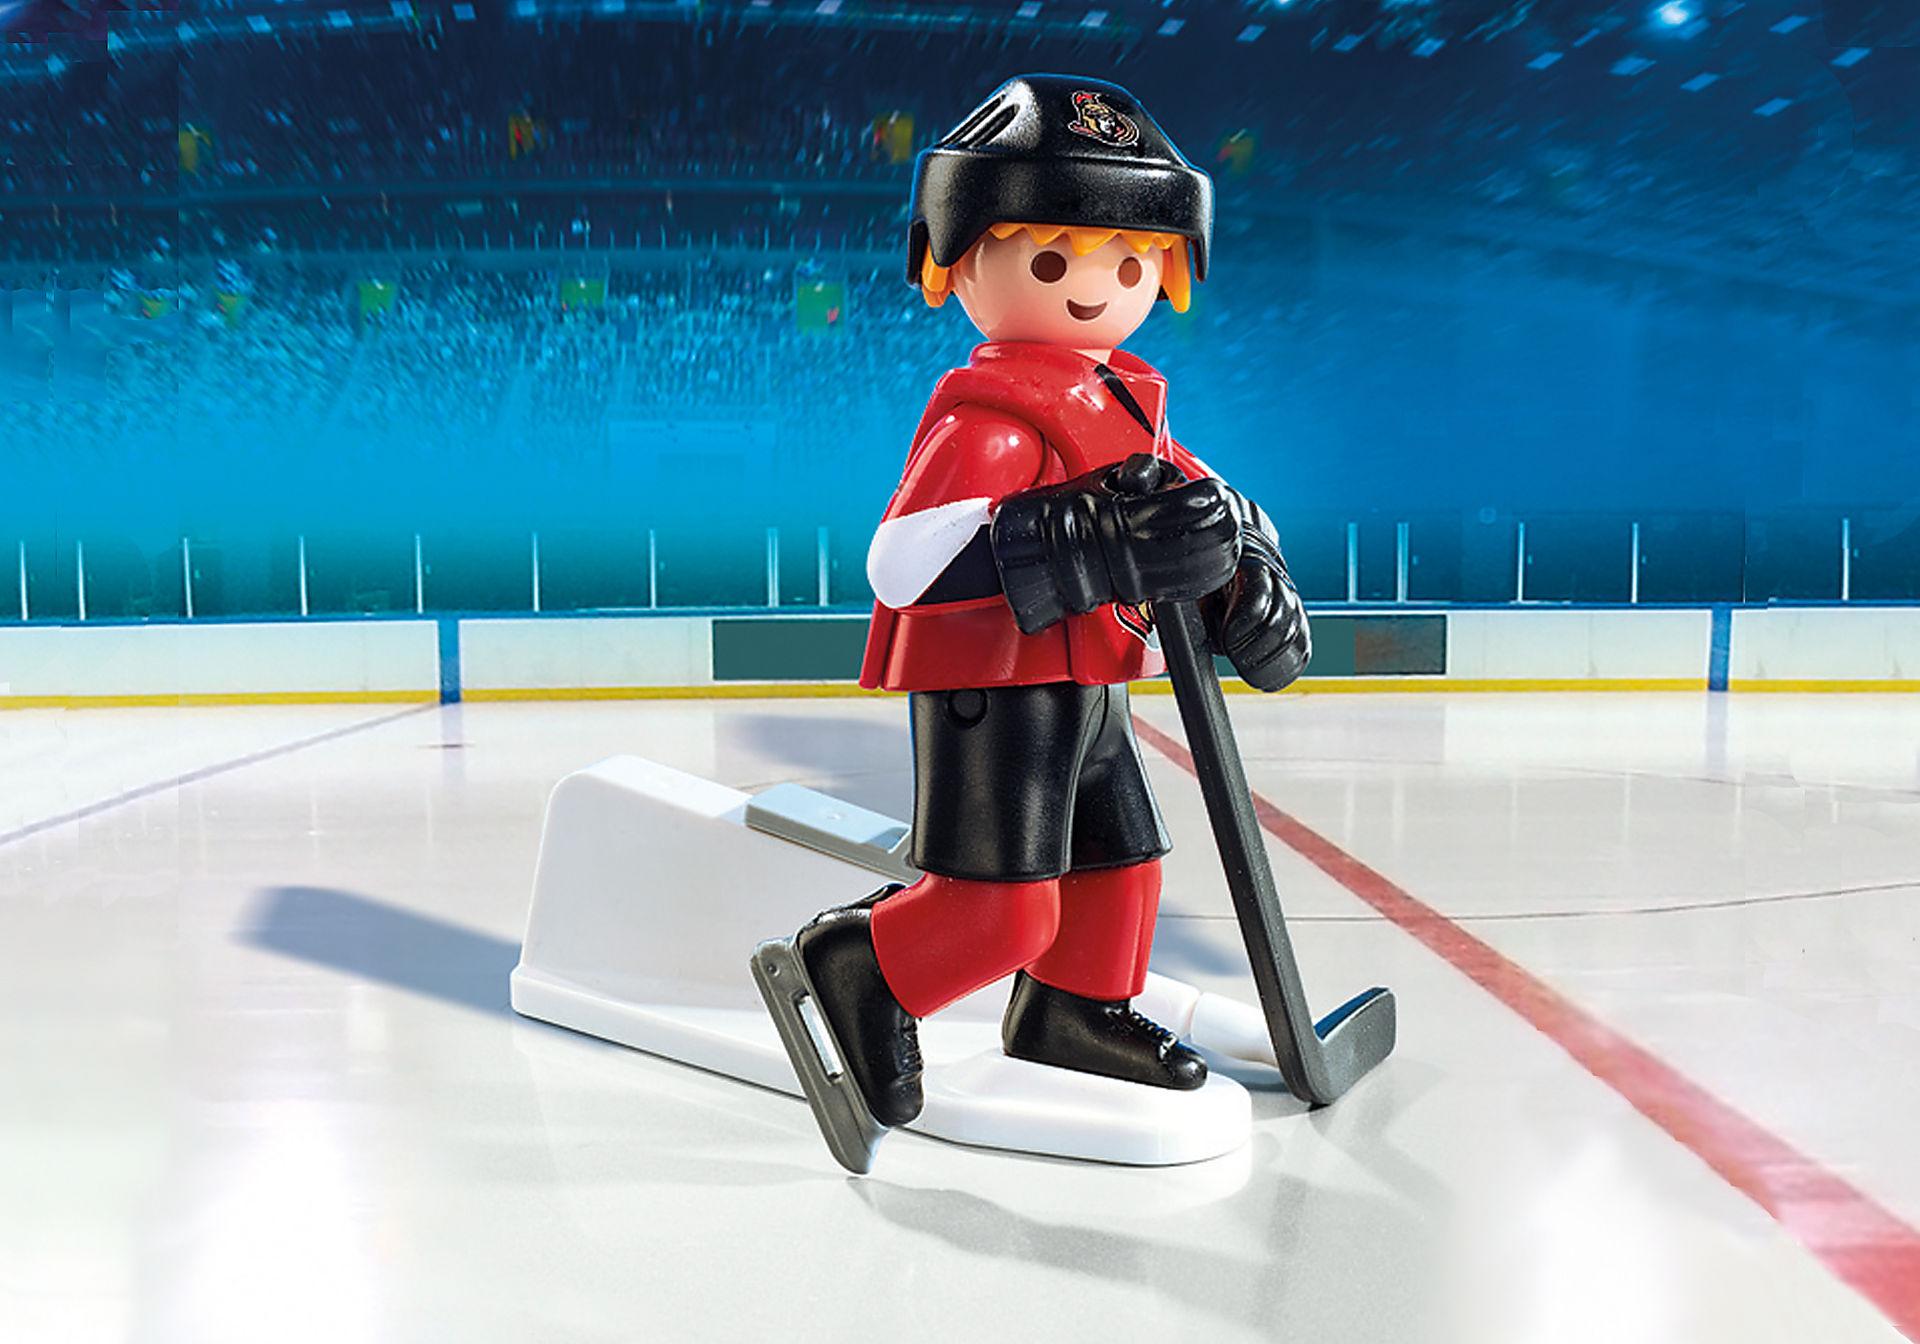 9019 NHL™ Ottawa Senators™ Player zoom image1